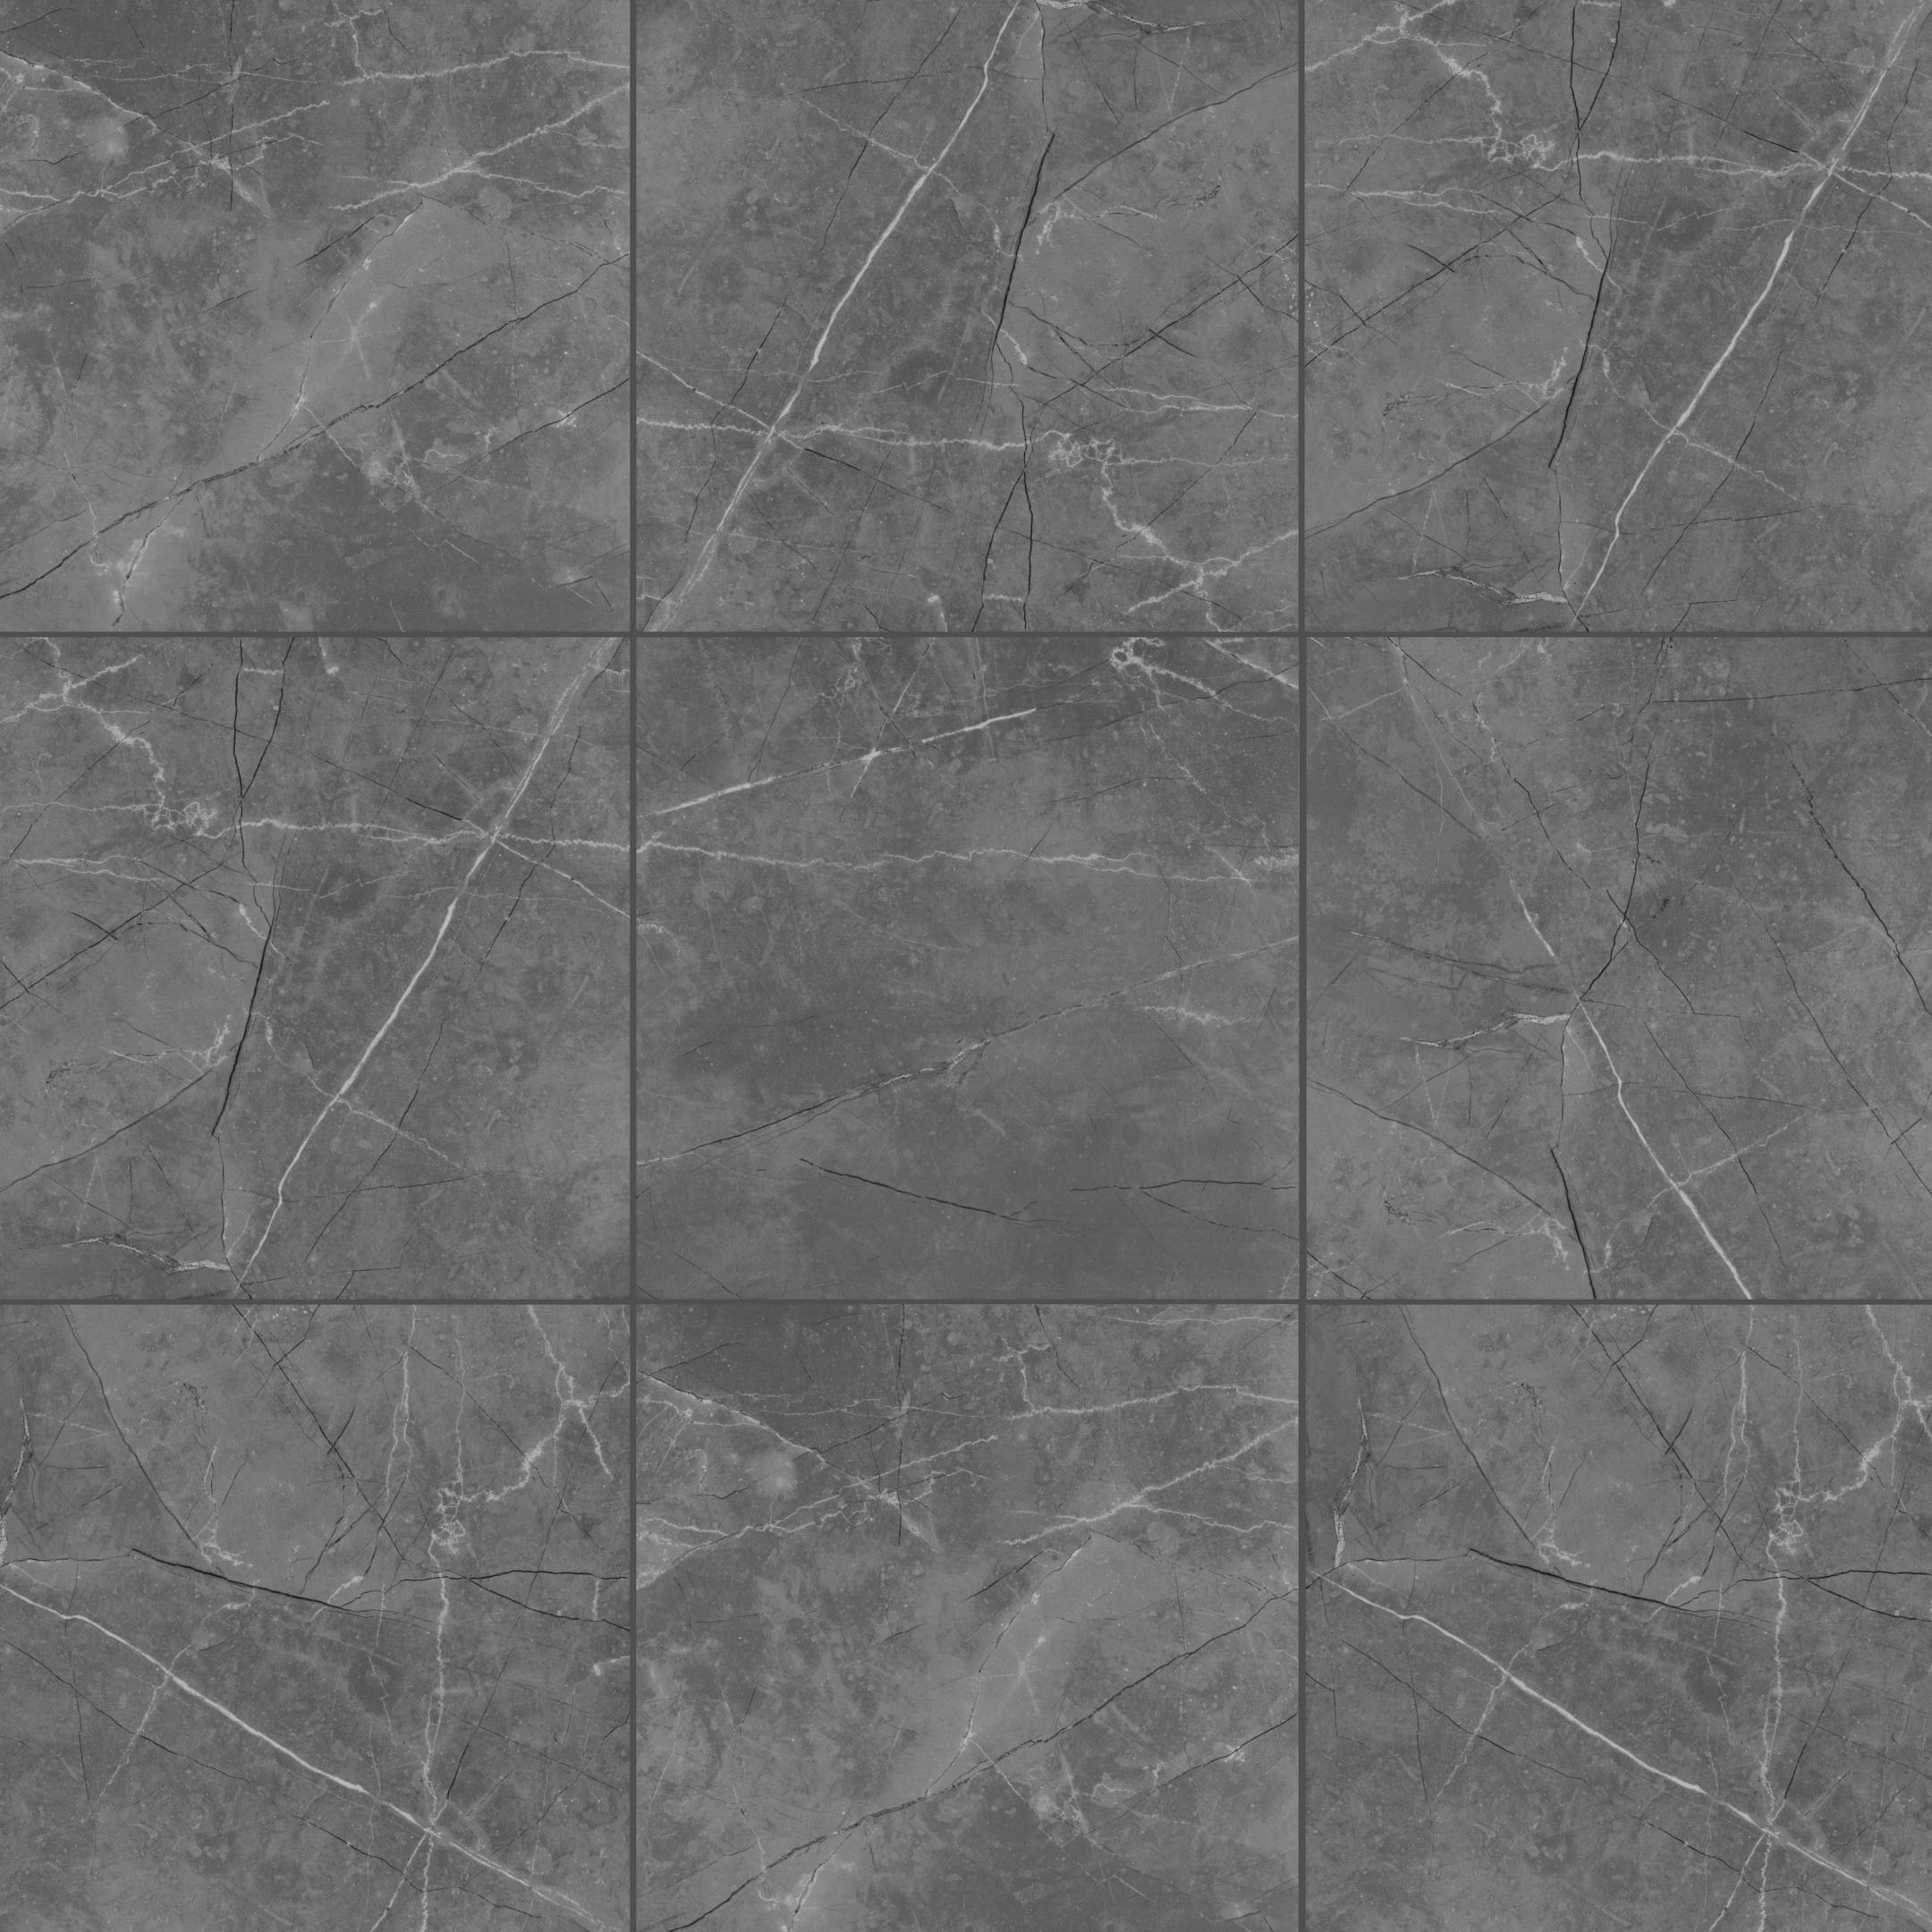 Керамогранит Grasaro Atrium серый 400х400х8 мм (10 шт.=1,6 кв.м) керамогранит grasaro atrium серый 400х400х8 мм 10 шт 1 6 кв м